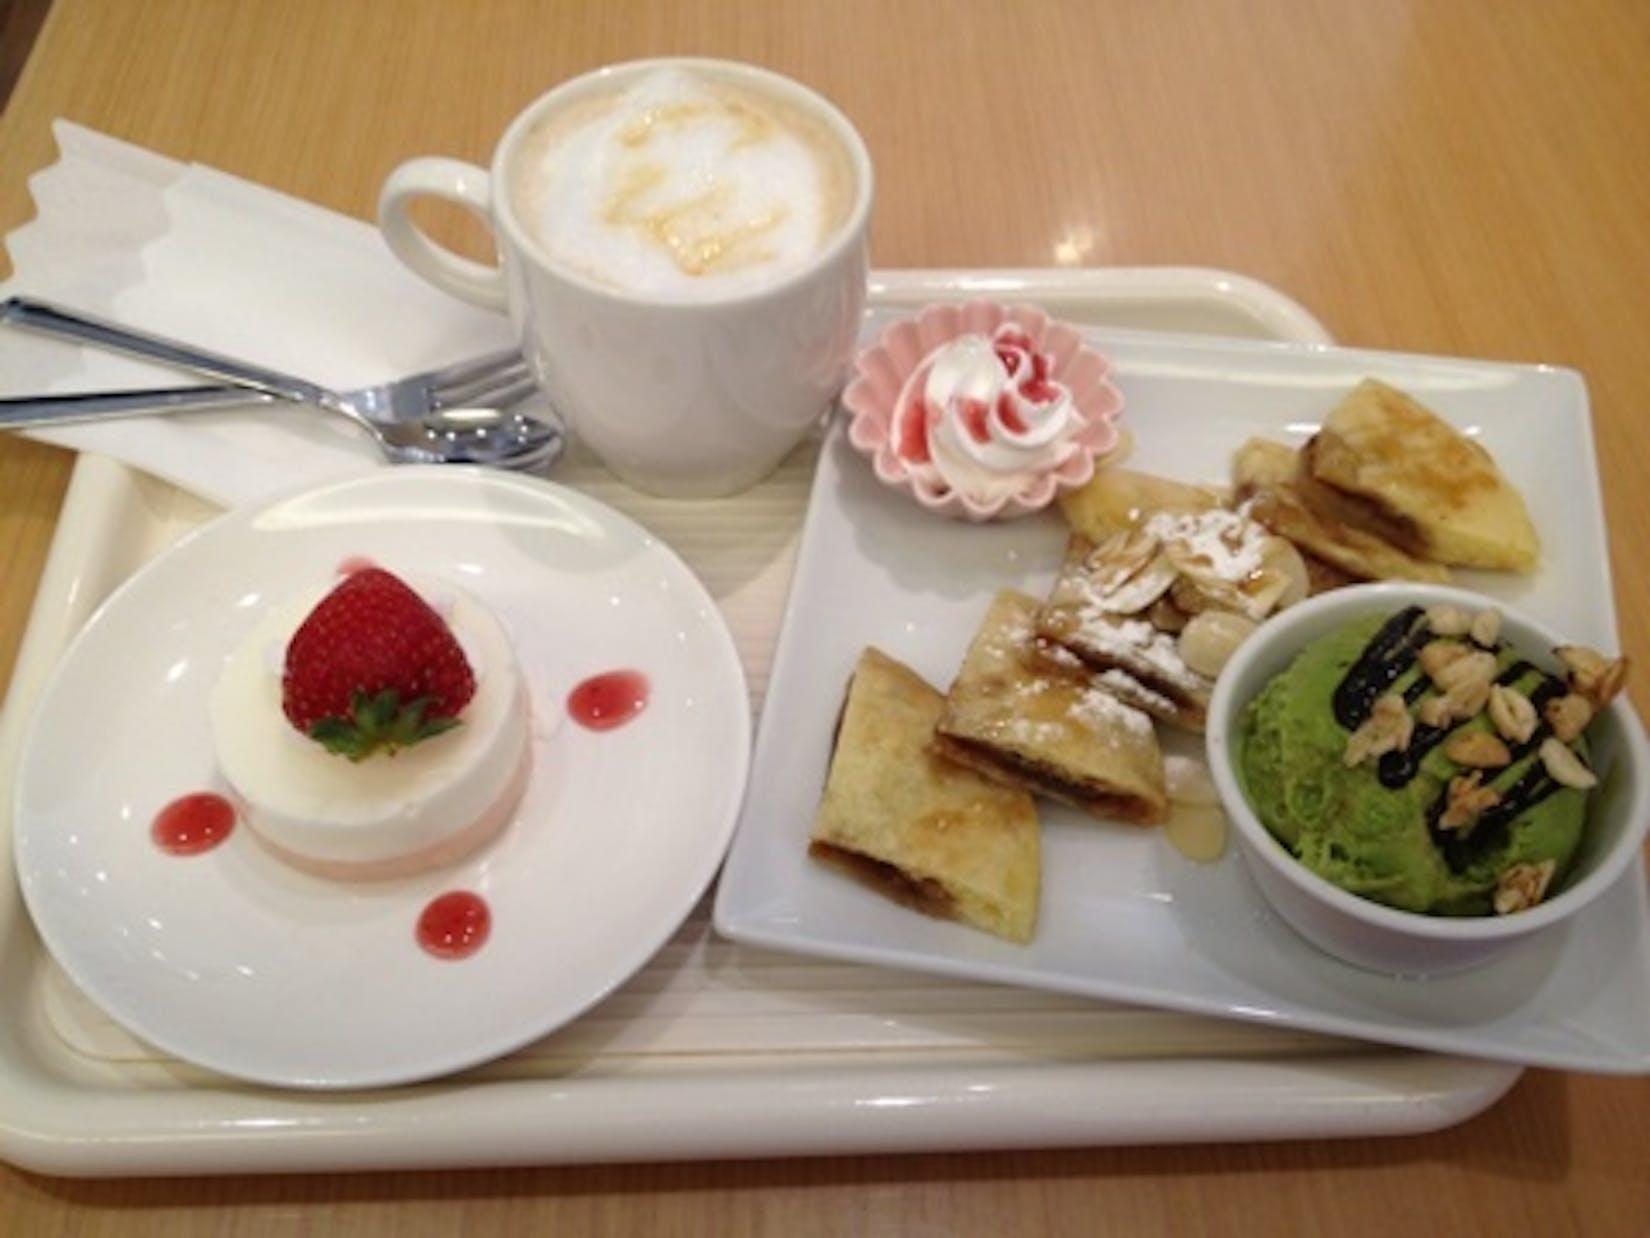 Lote Thar Myanmar Food & Cafe | yathar